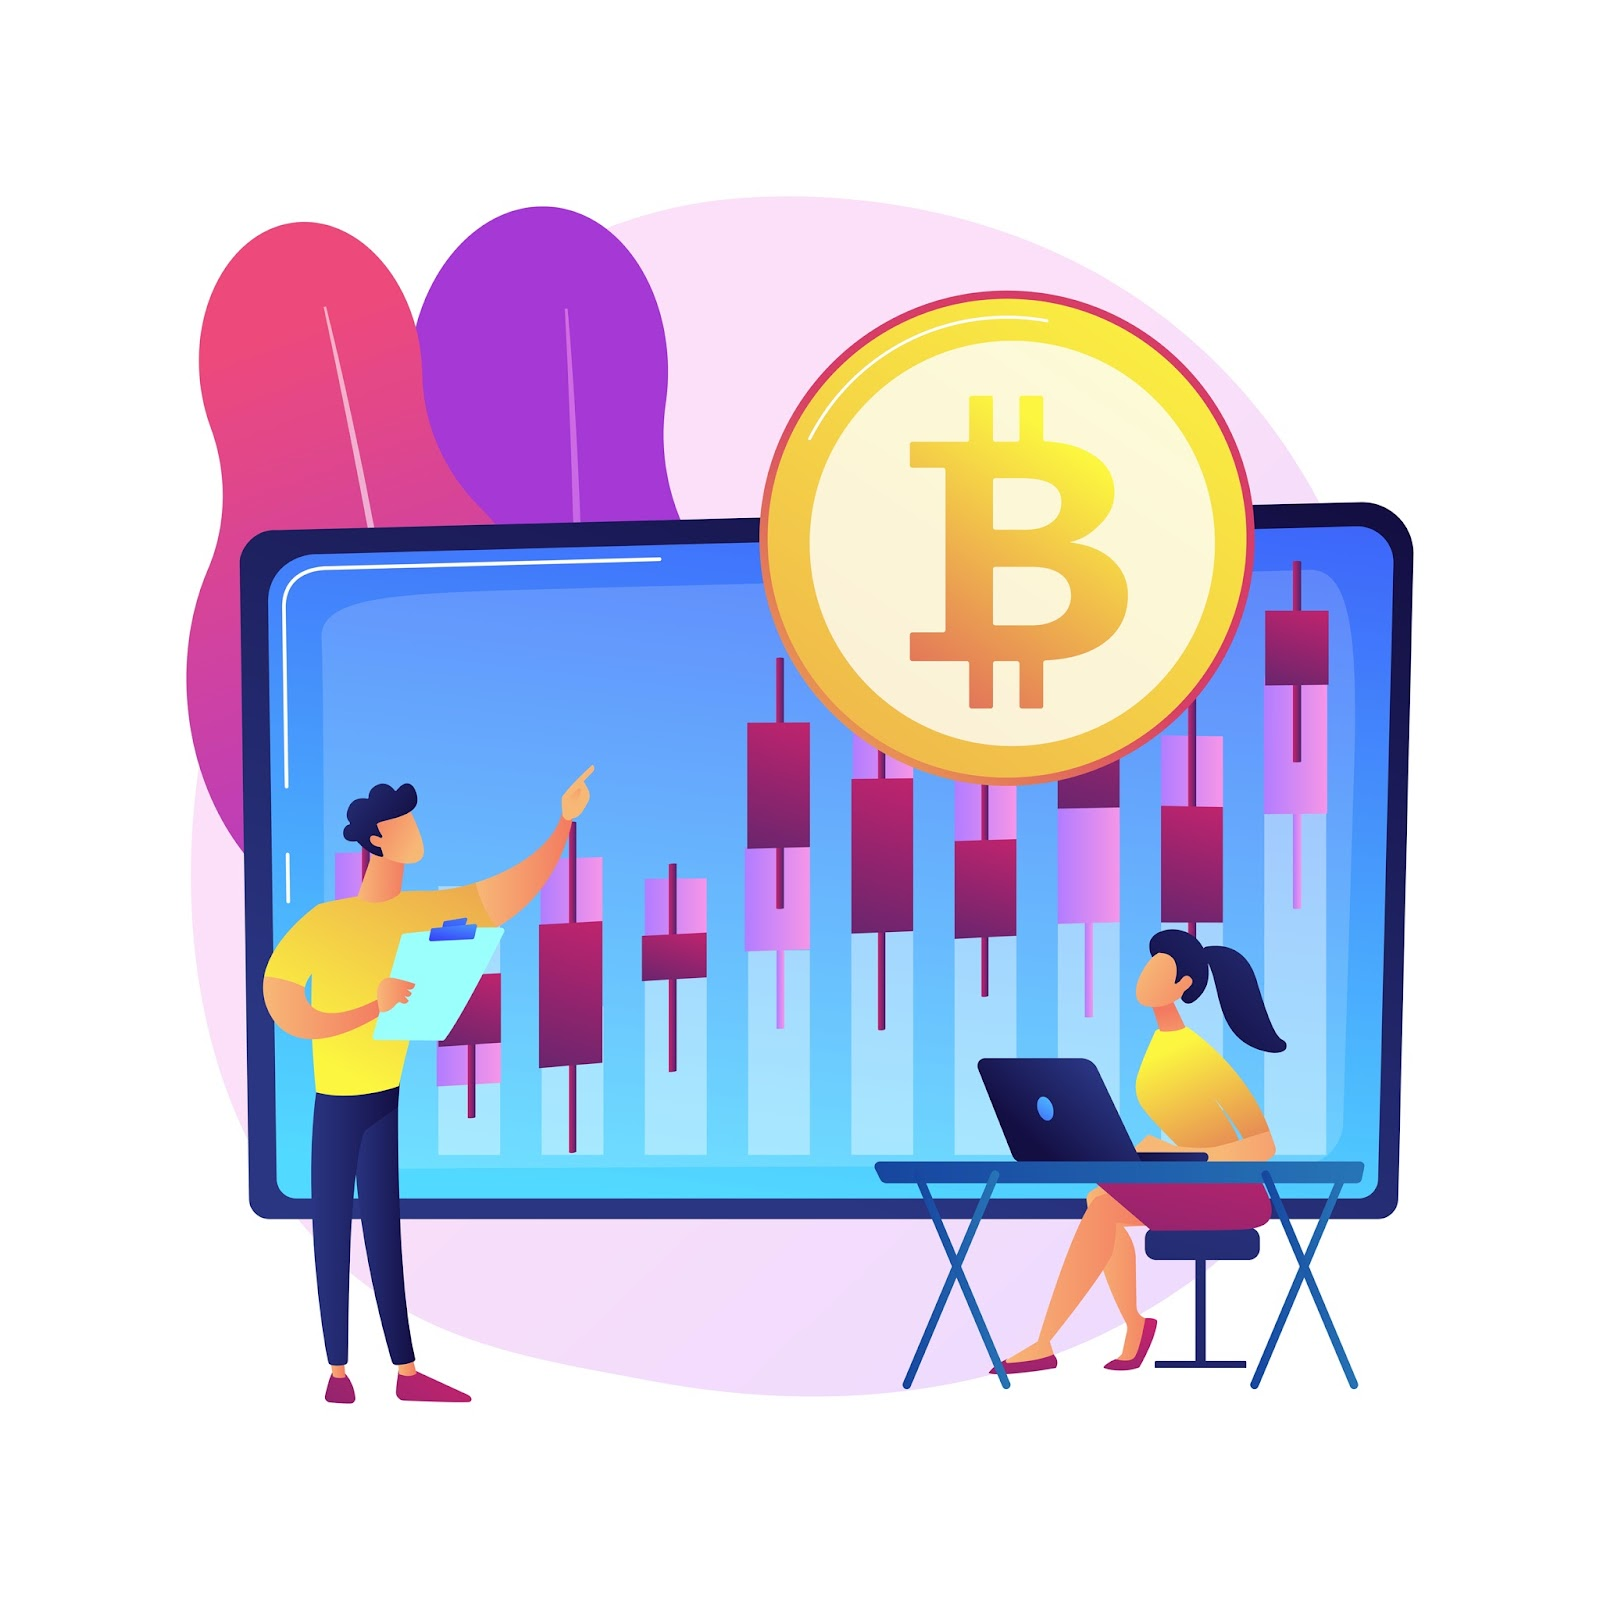 Ways to lose money trading Bitcoin